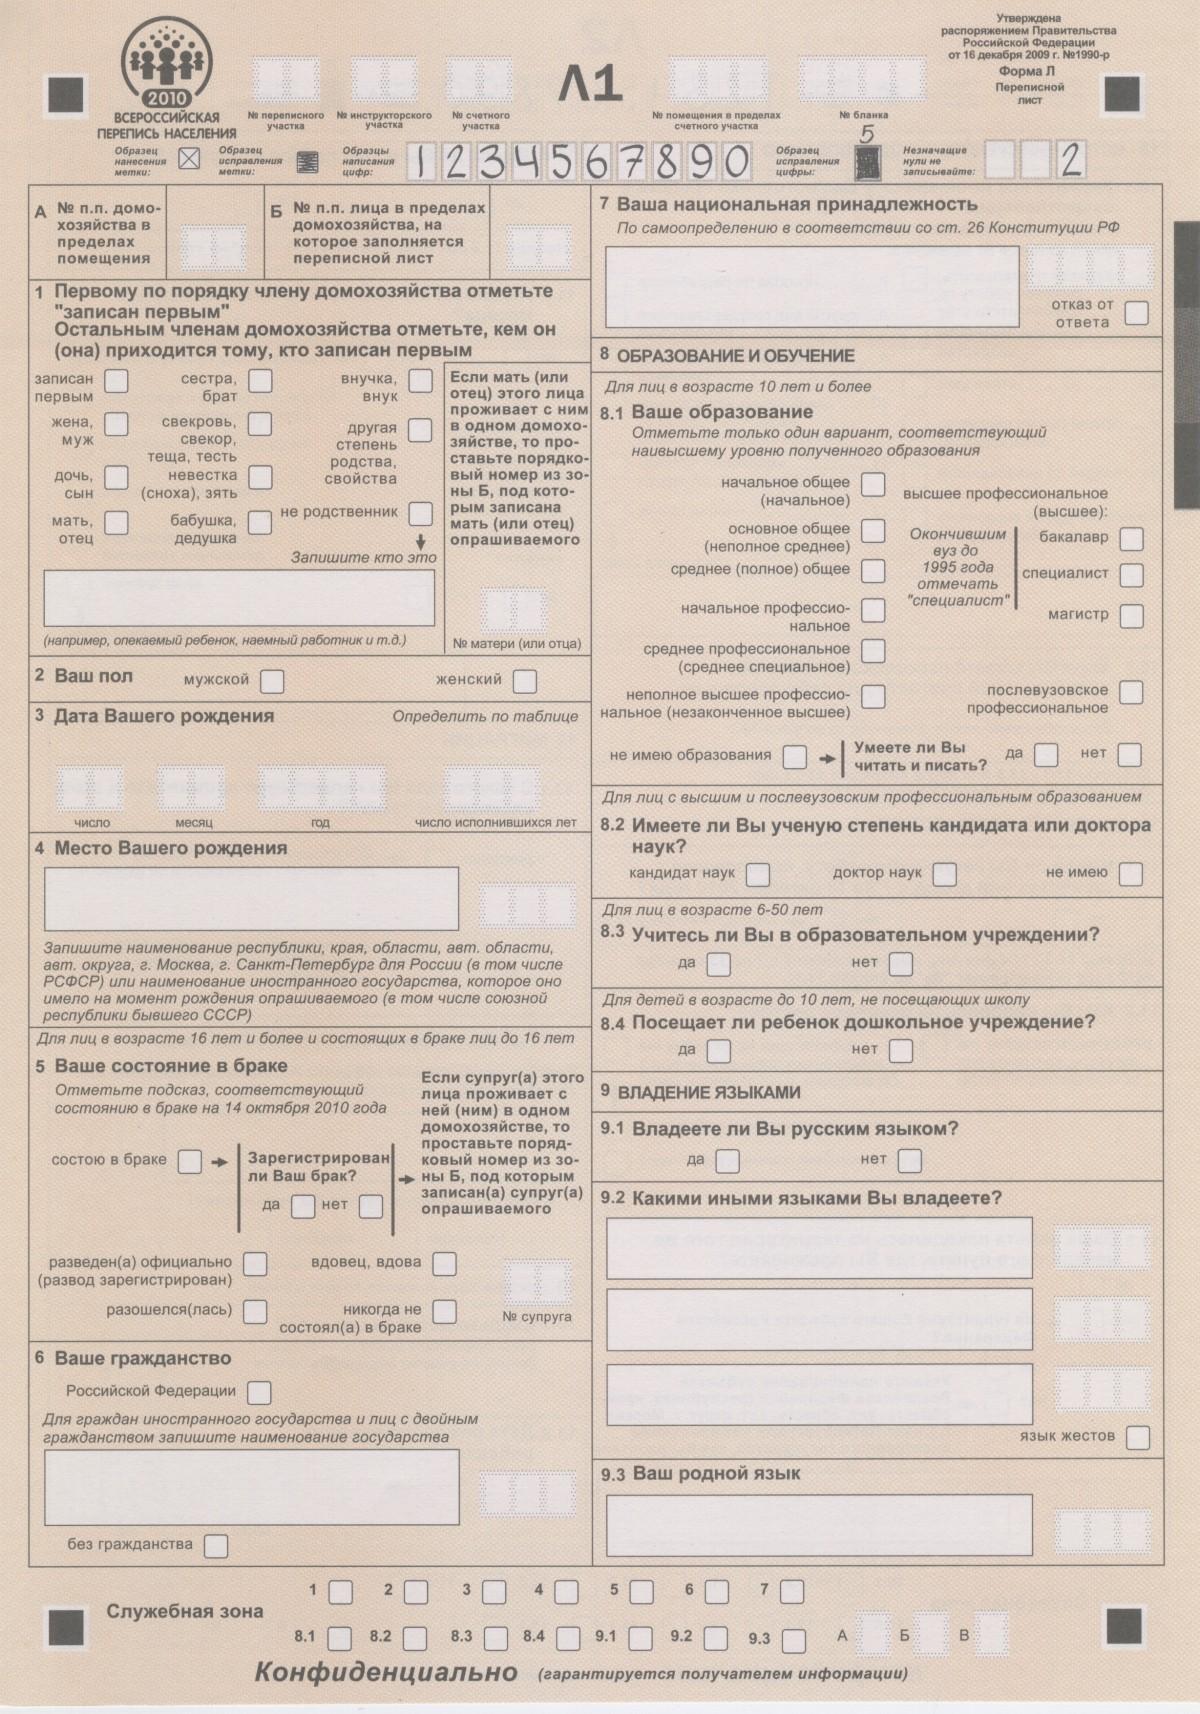 https://upload.wikimedia.org/wikipedia/commons/c/cd/Russian_Census_2010_-_Form_L_%281%29.jpg?uselang=ru